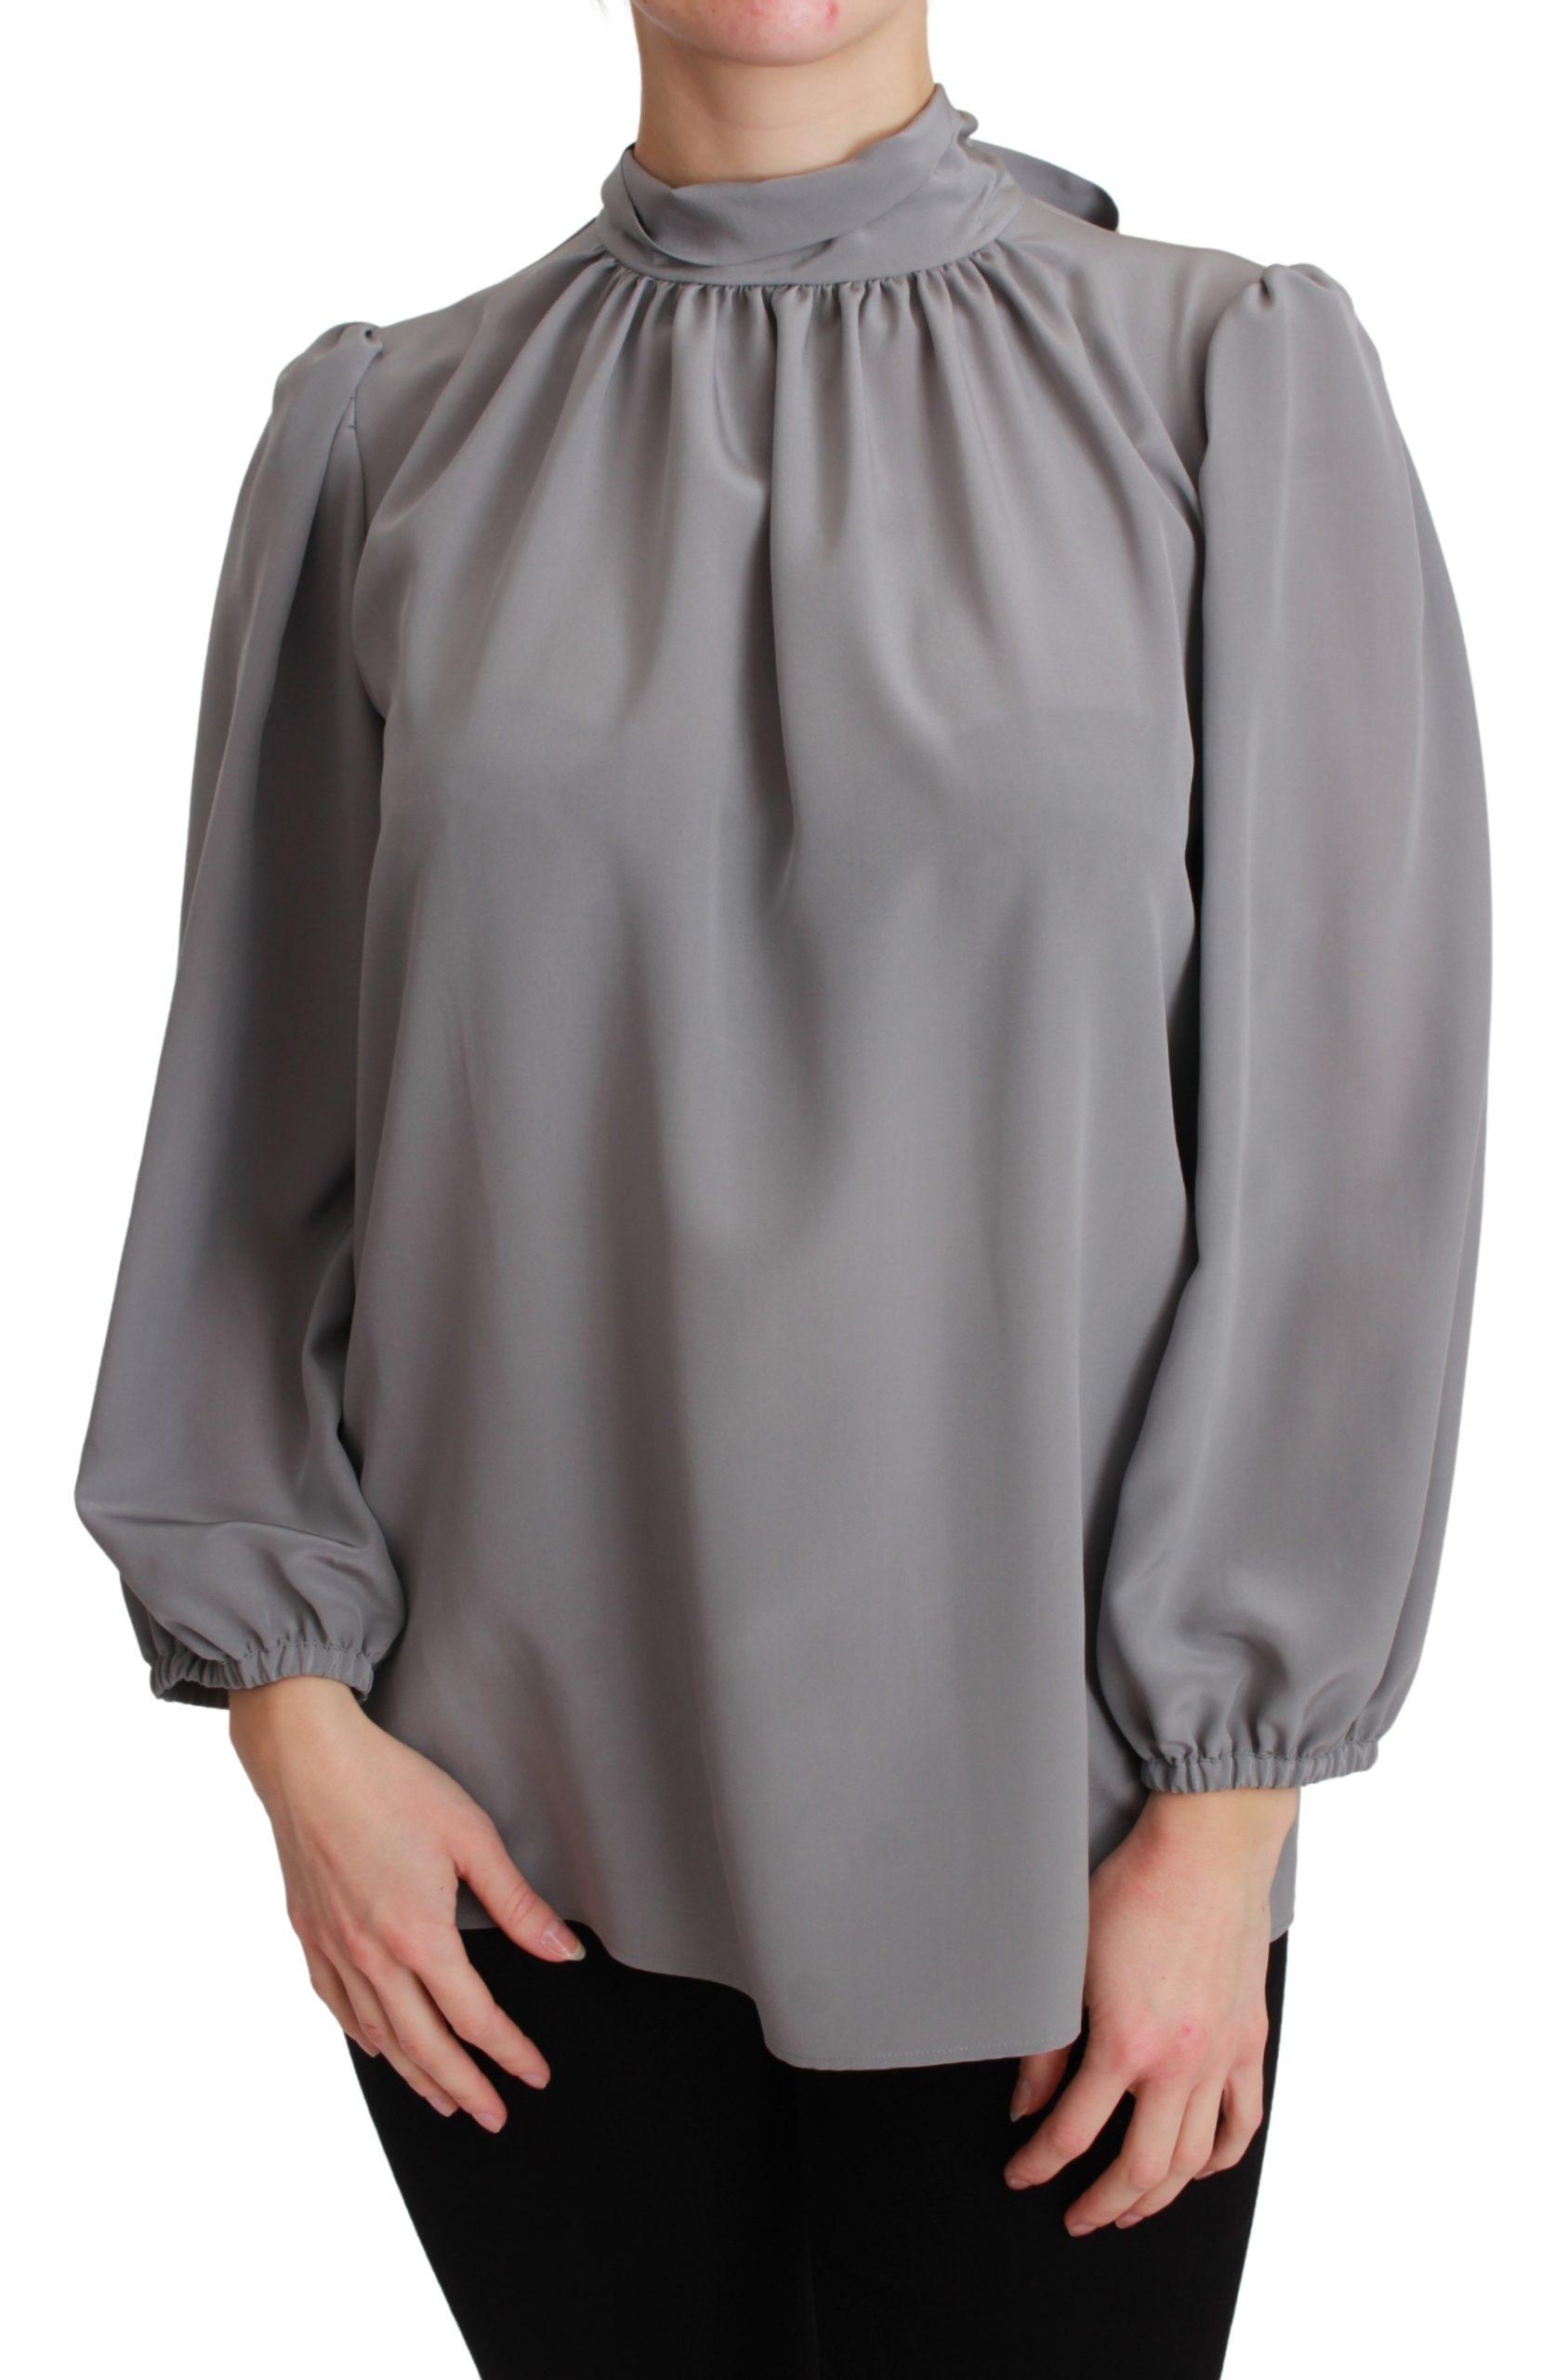 Dolce & Gabbana Women's Silk Neck Bow Shirt Gray TSH2675 - IT38 XS